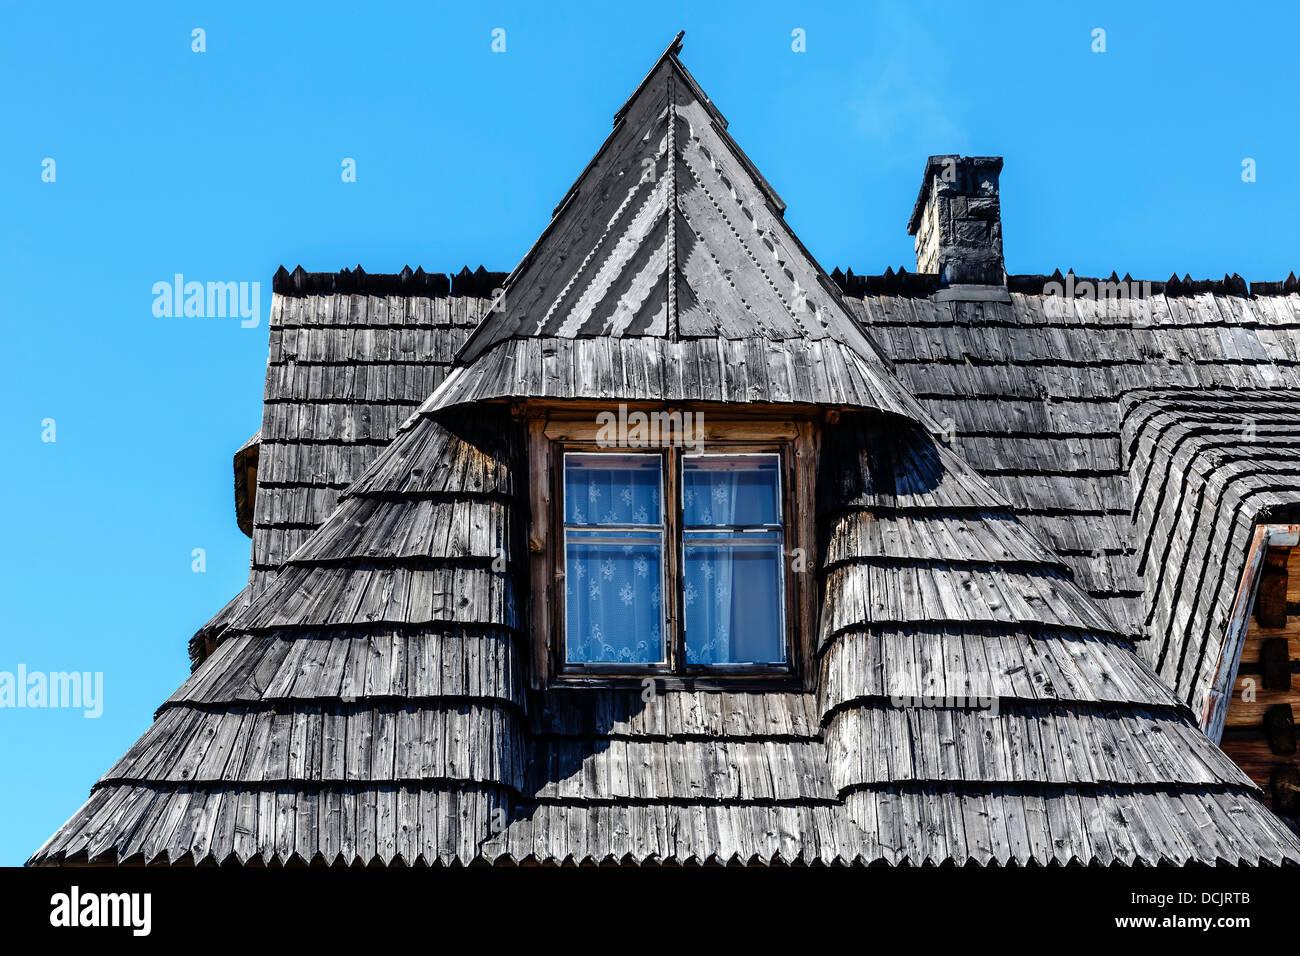 Traditionelle Dachschräge in Zakopane Stockbild